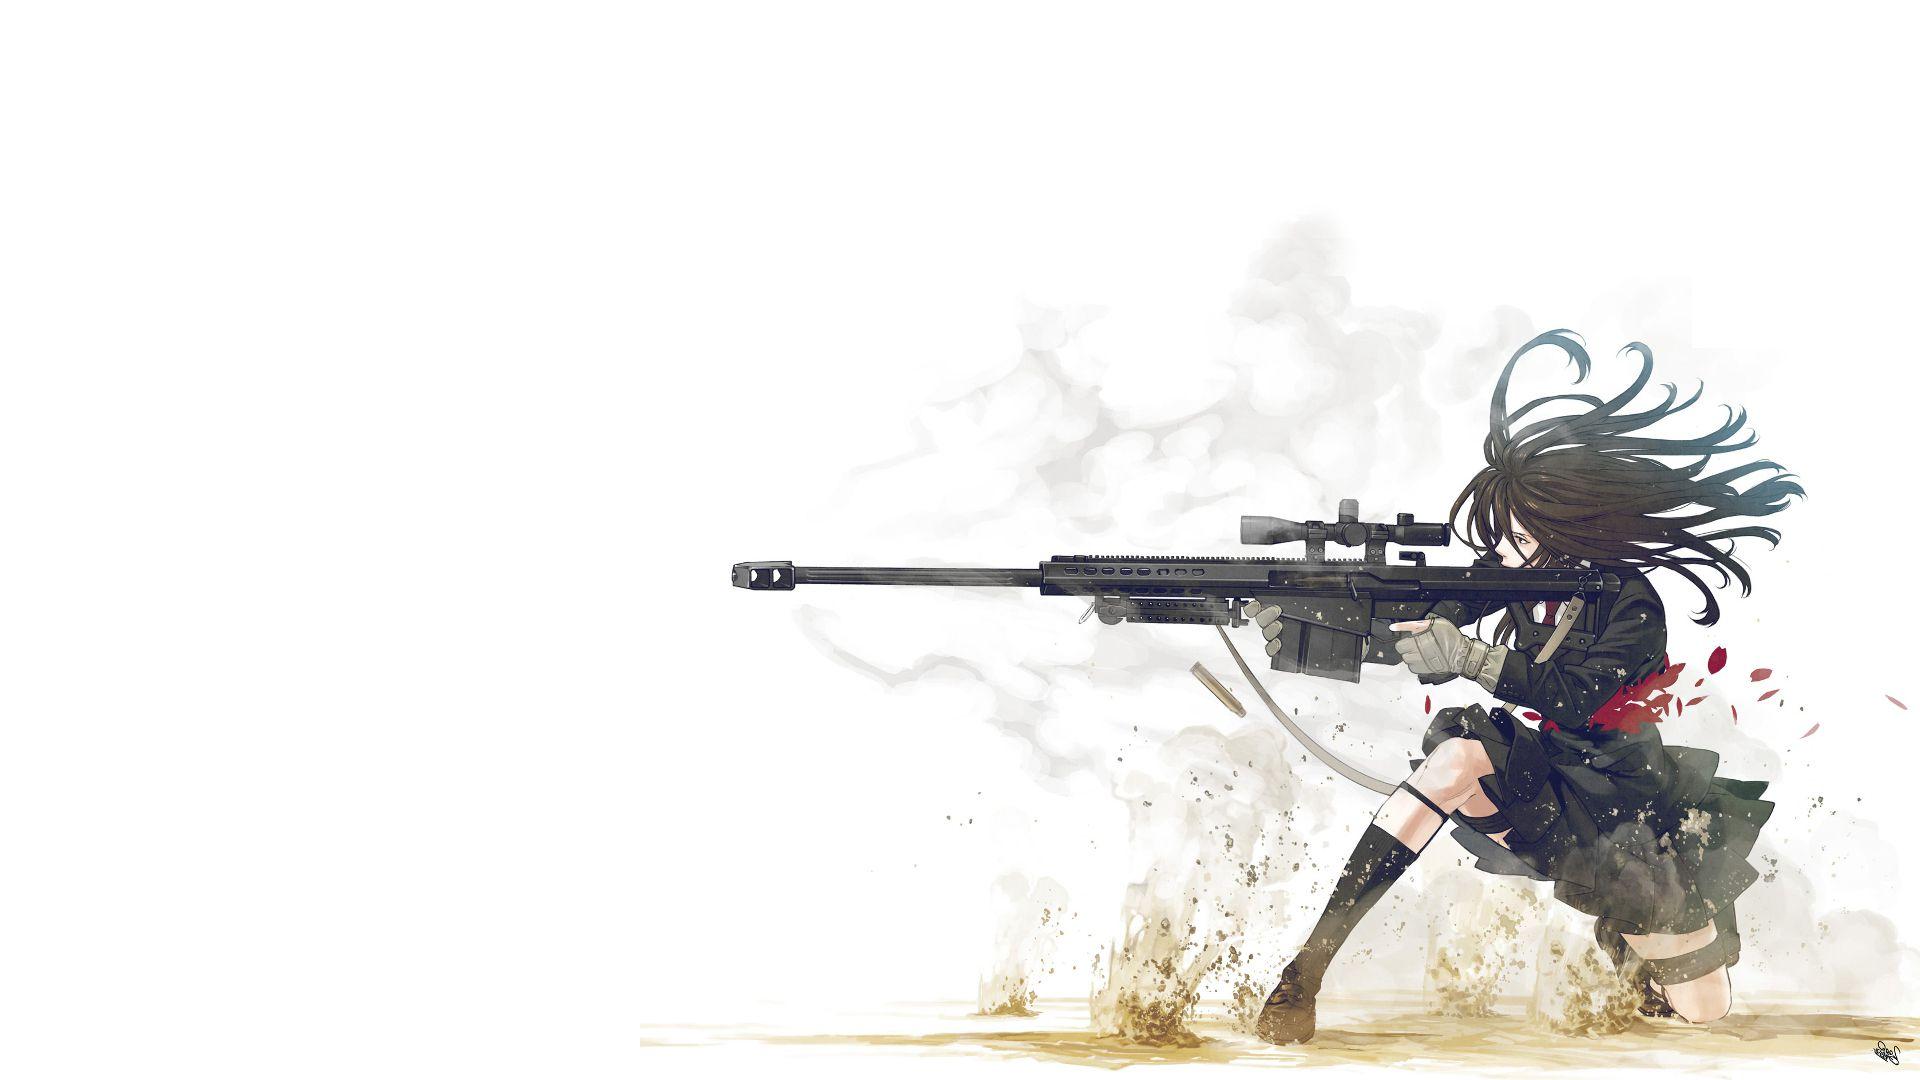 Anime Girl With Gun HD Wallpaper 1920x1080 girl